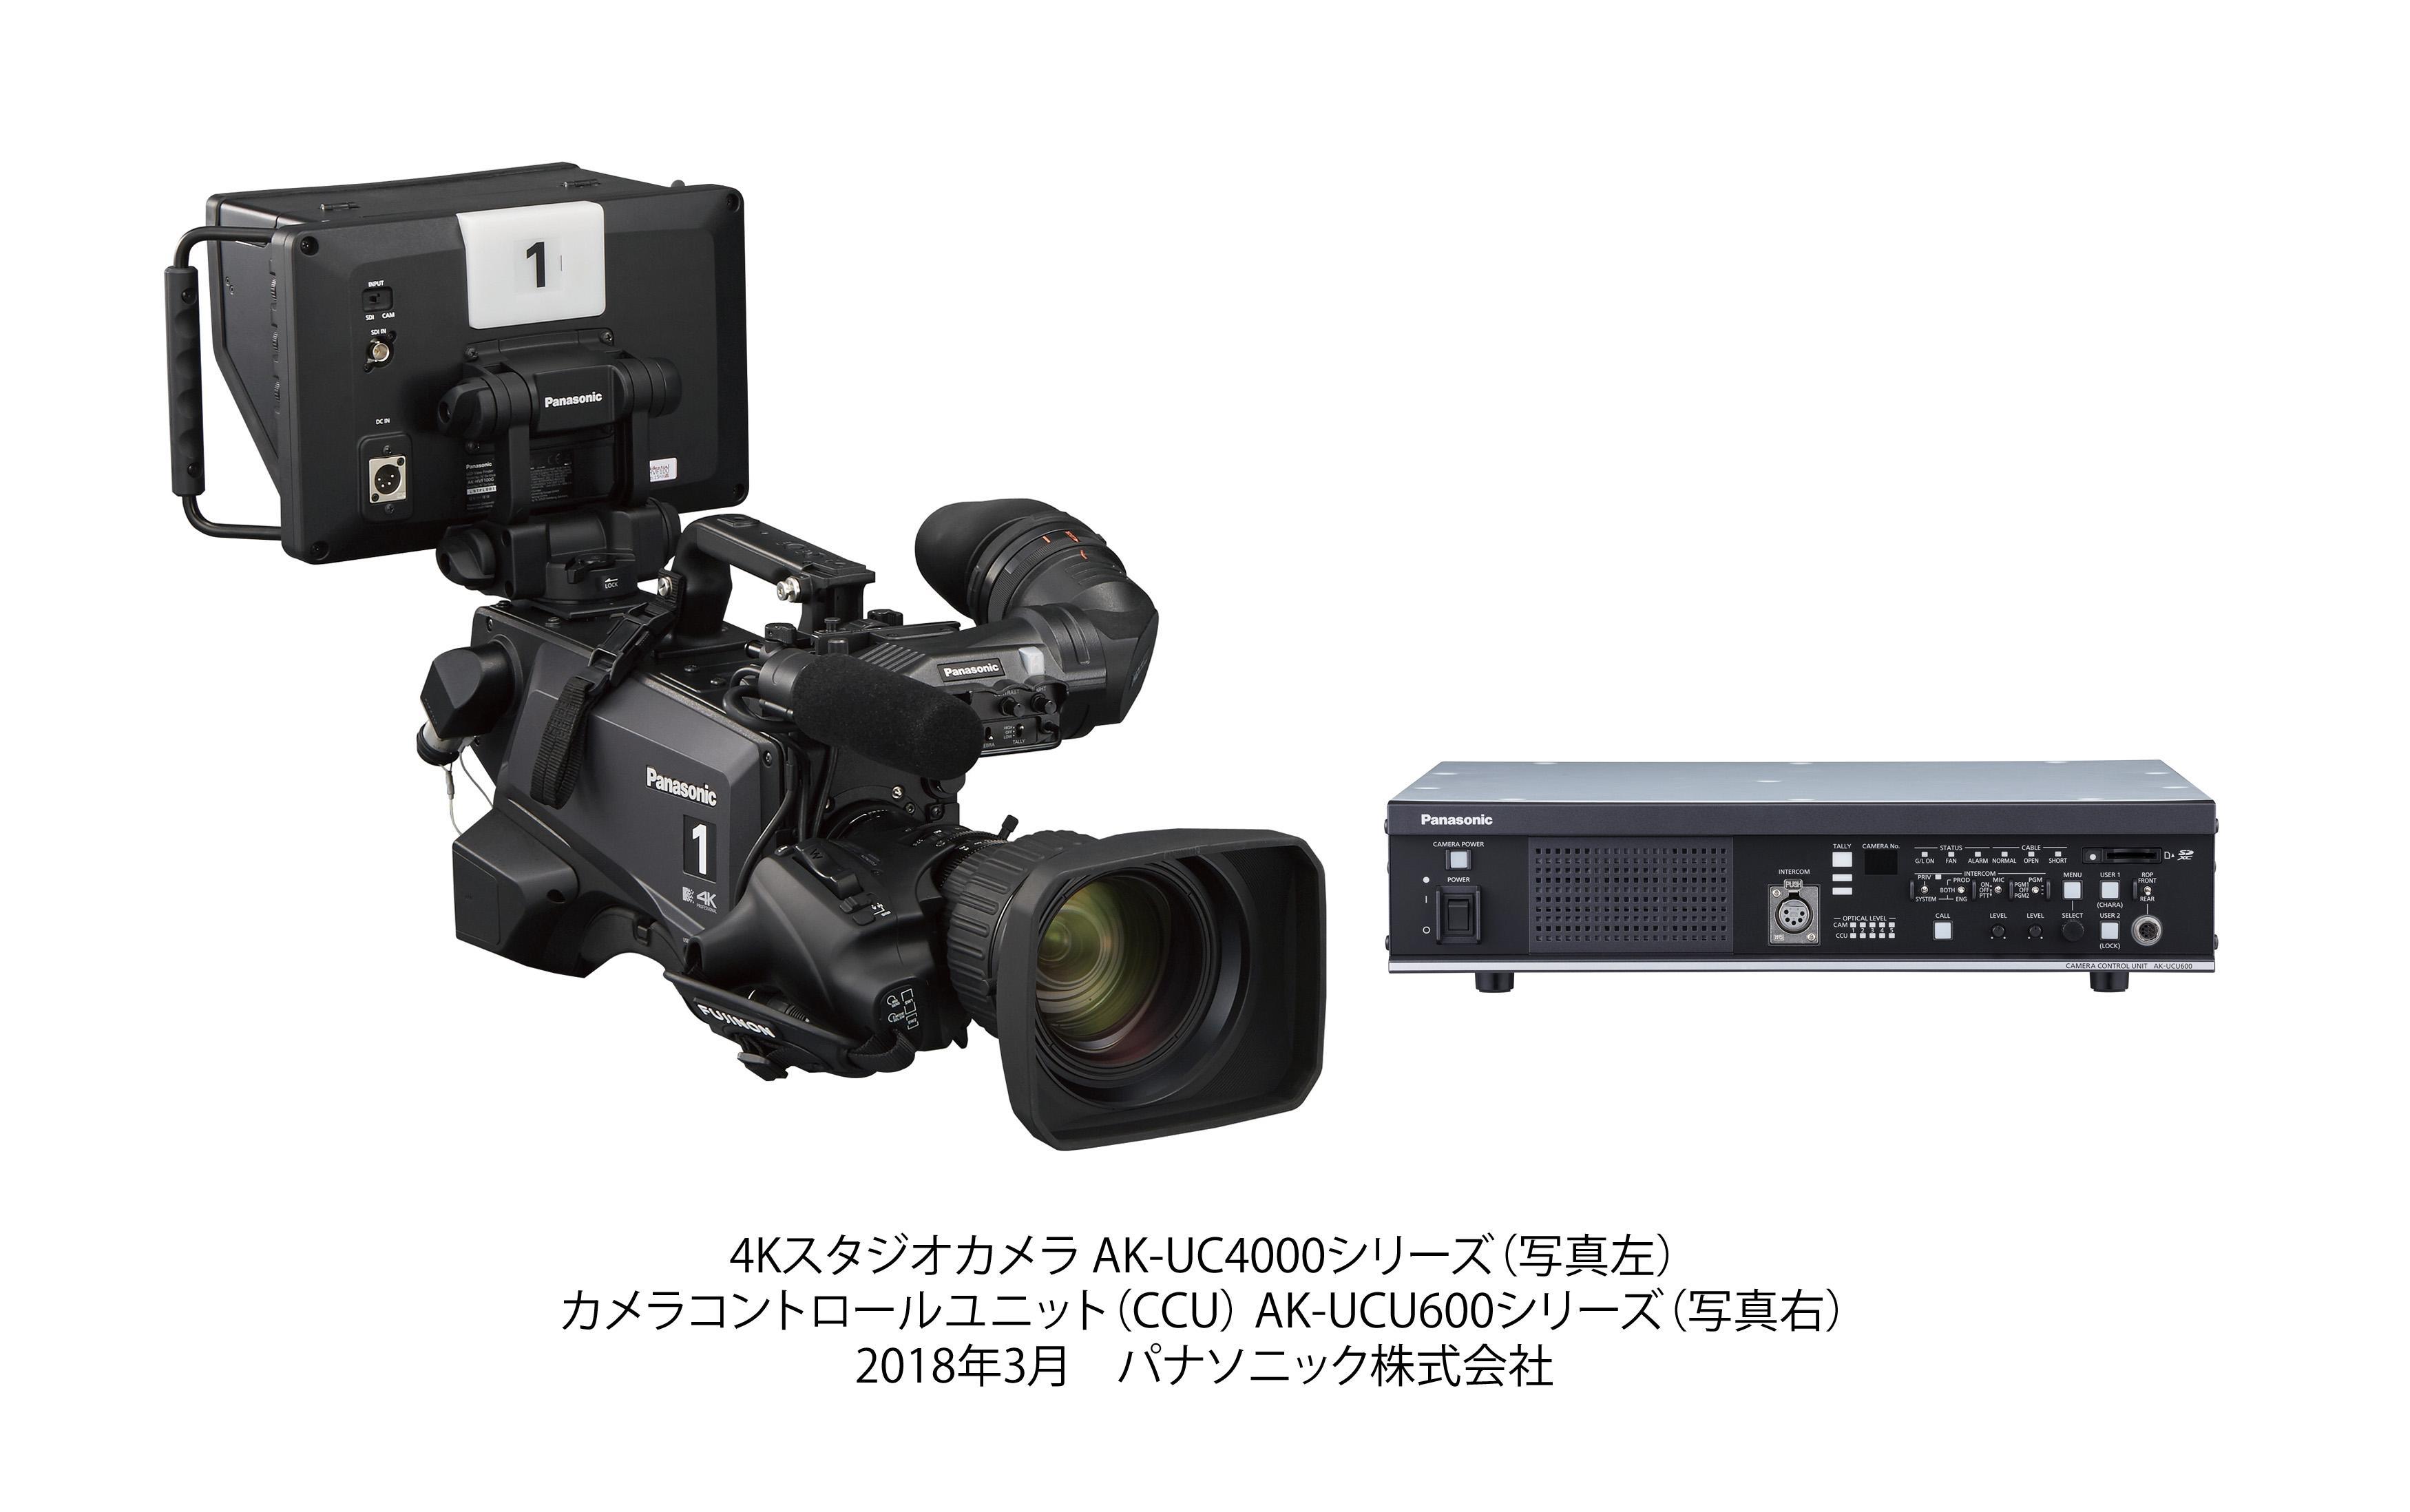 4Kスタジオカメラ(写真左)、カメラコントロールユニット(CCU)(写真右)